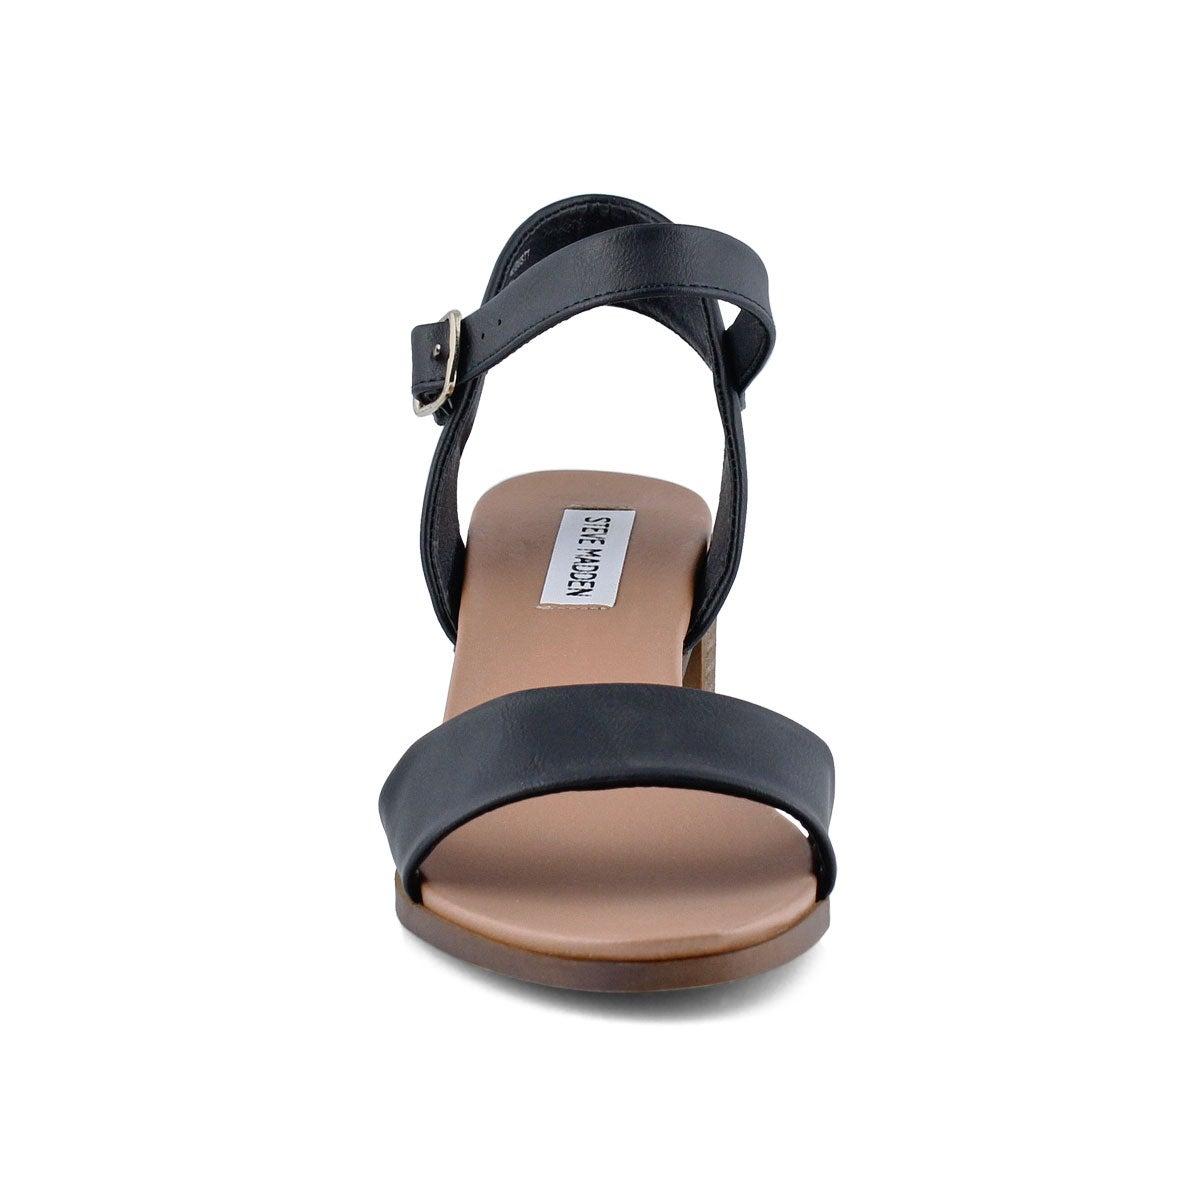 Lds August black dress sandal